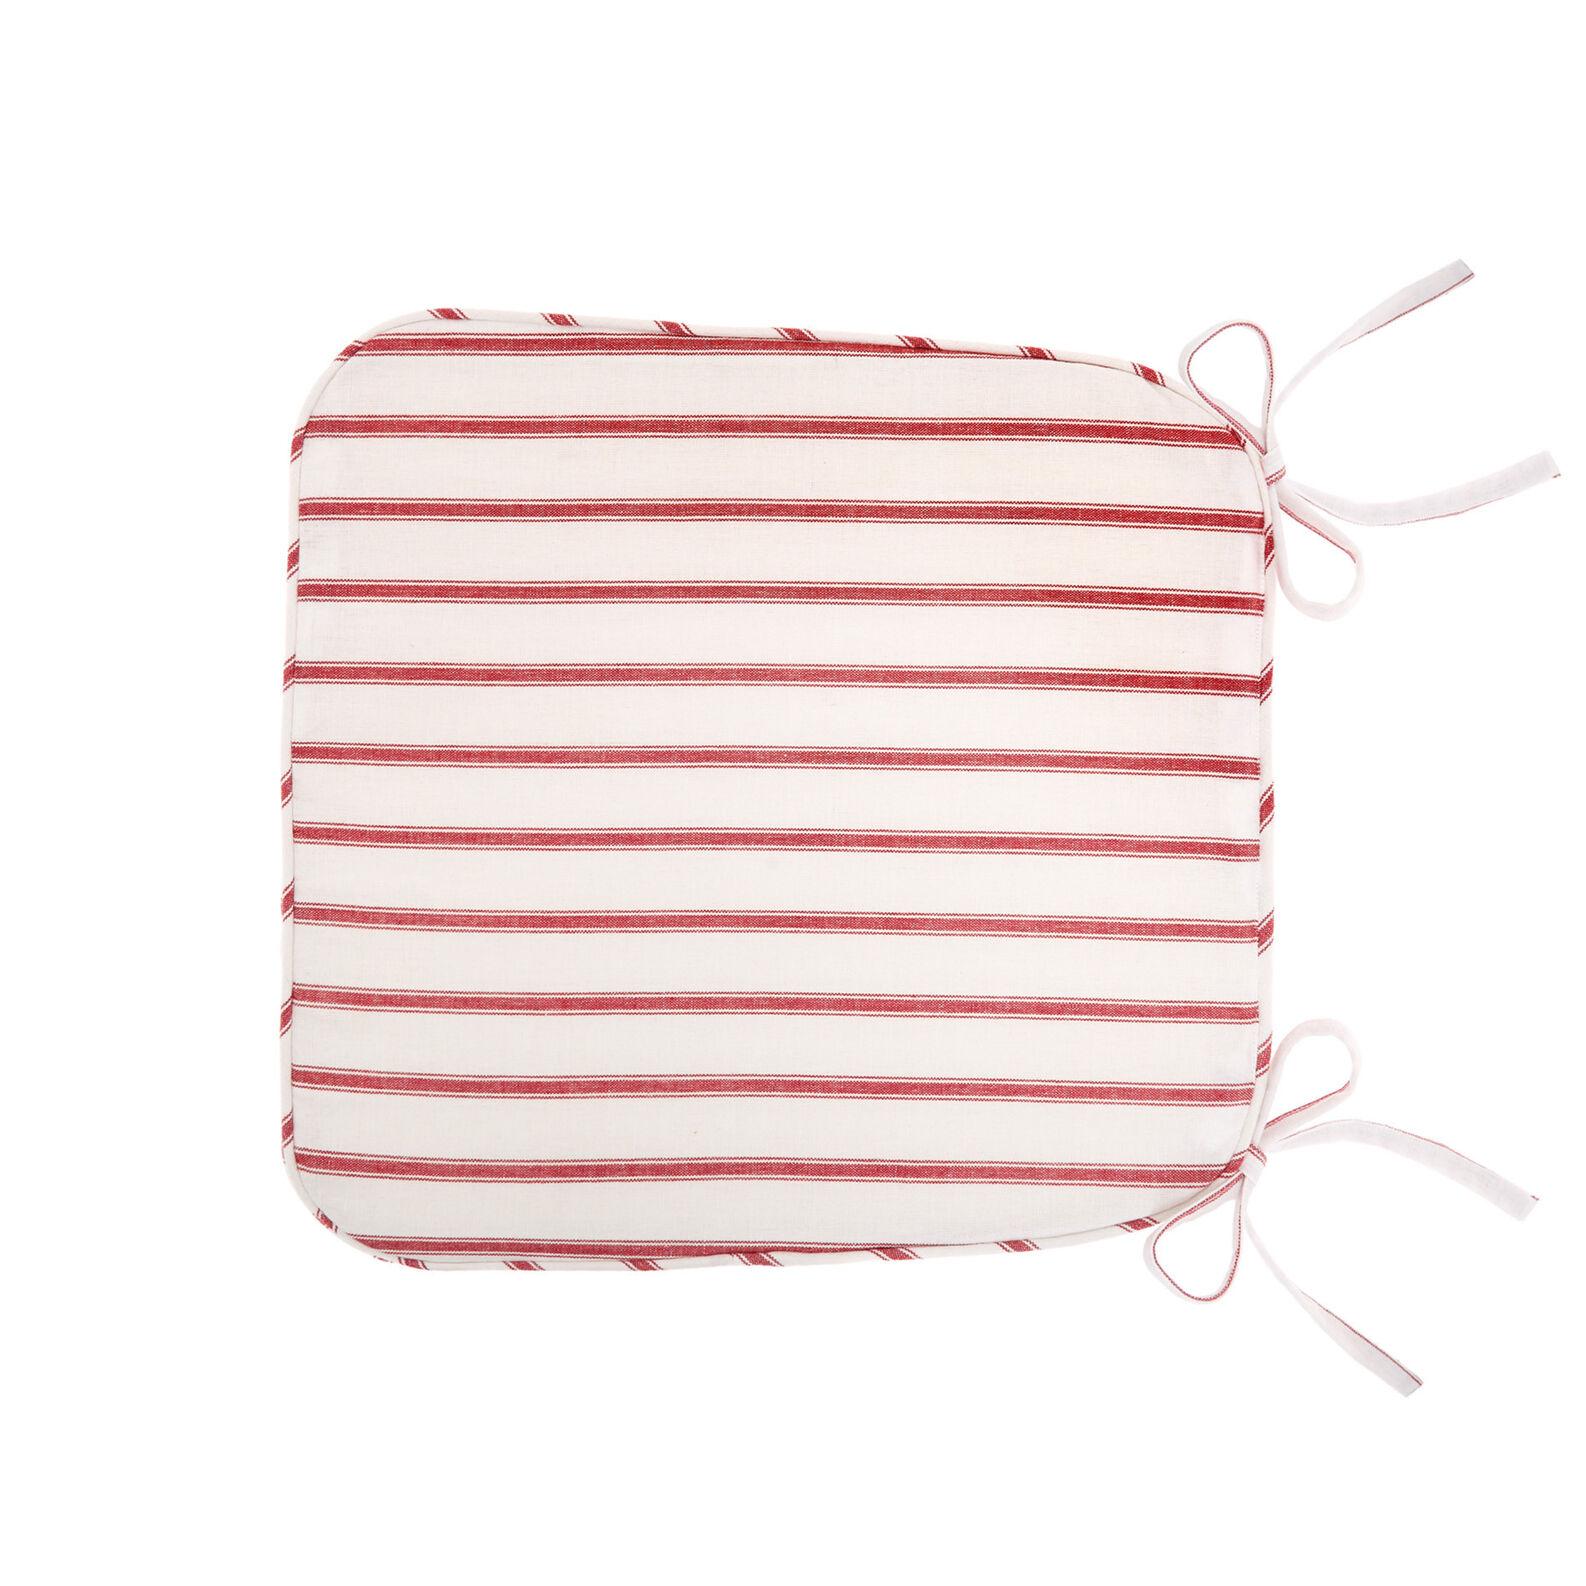 100% cotton striped kitchen seat pad